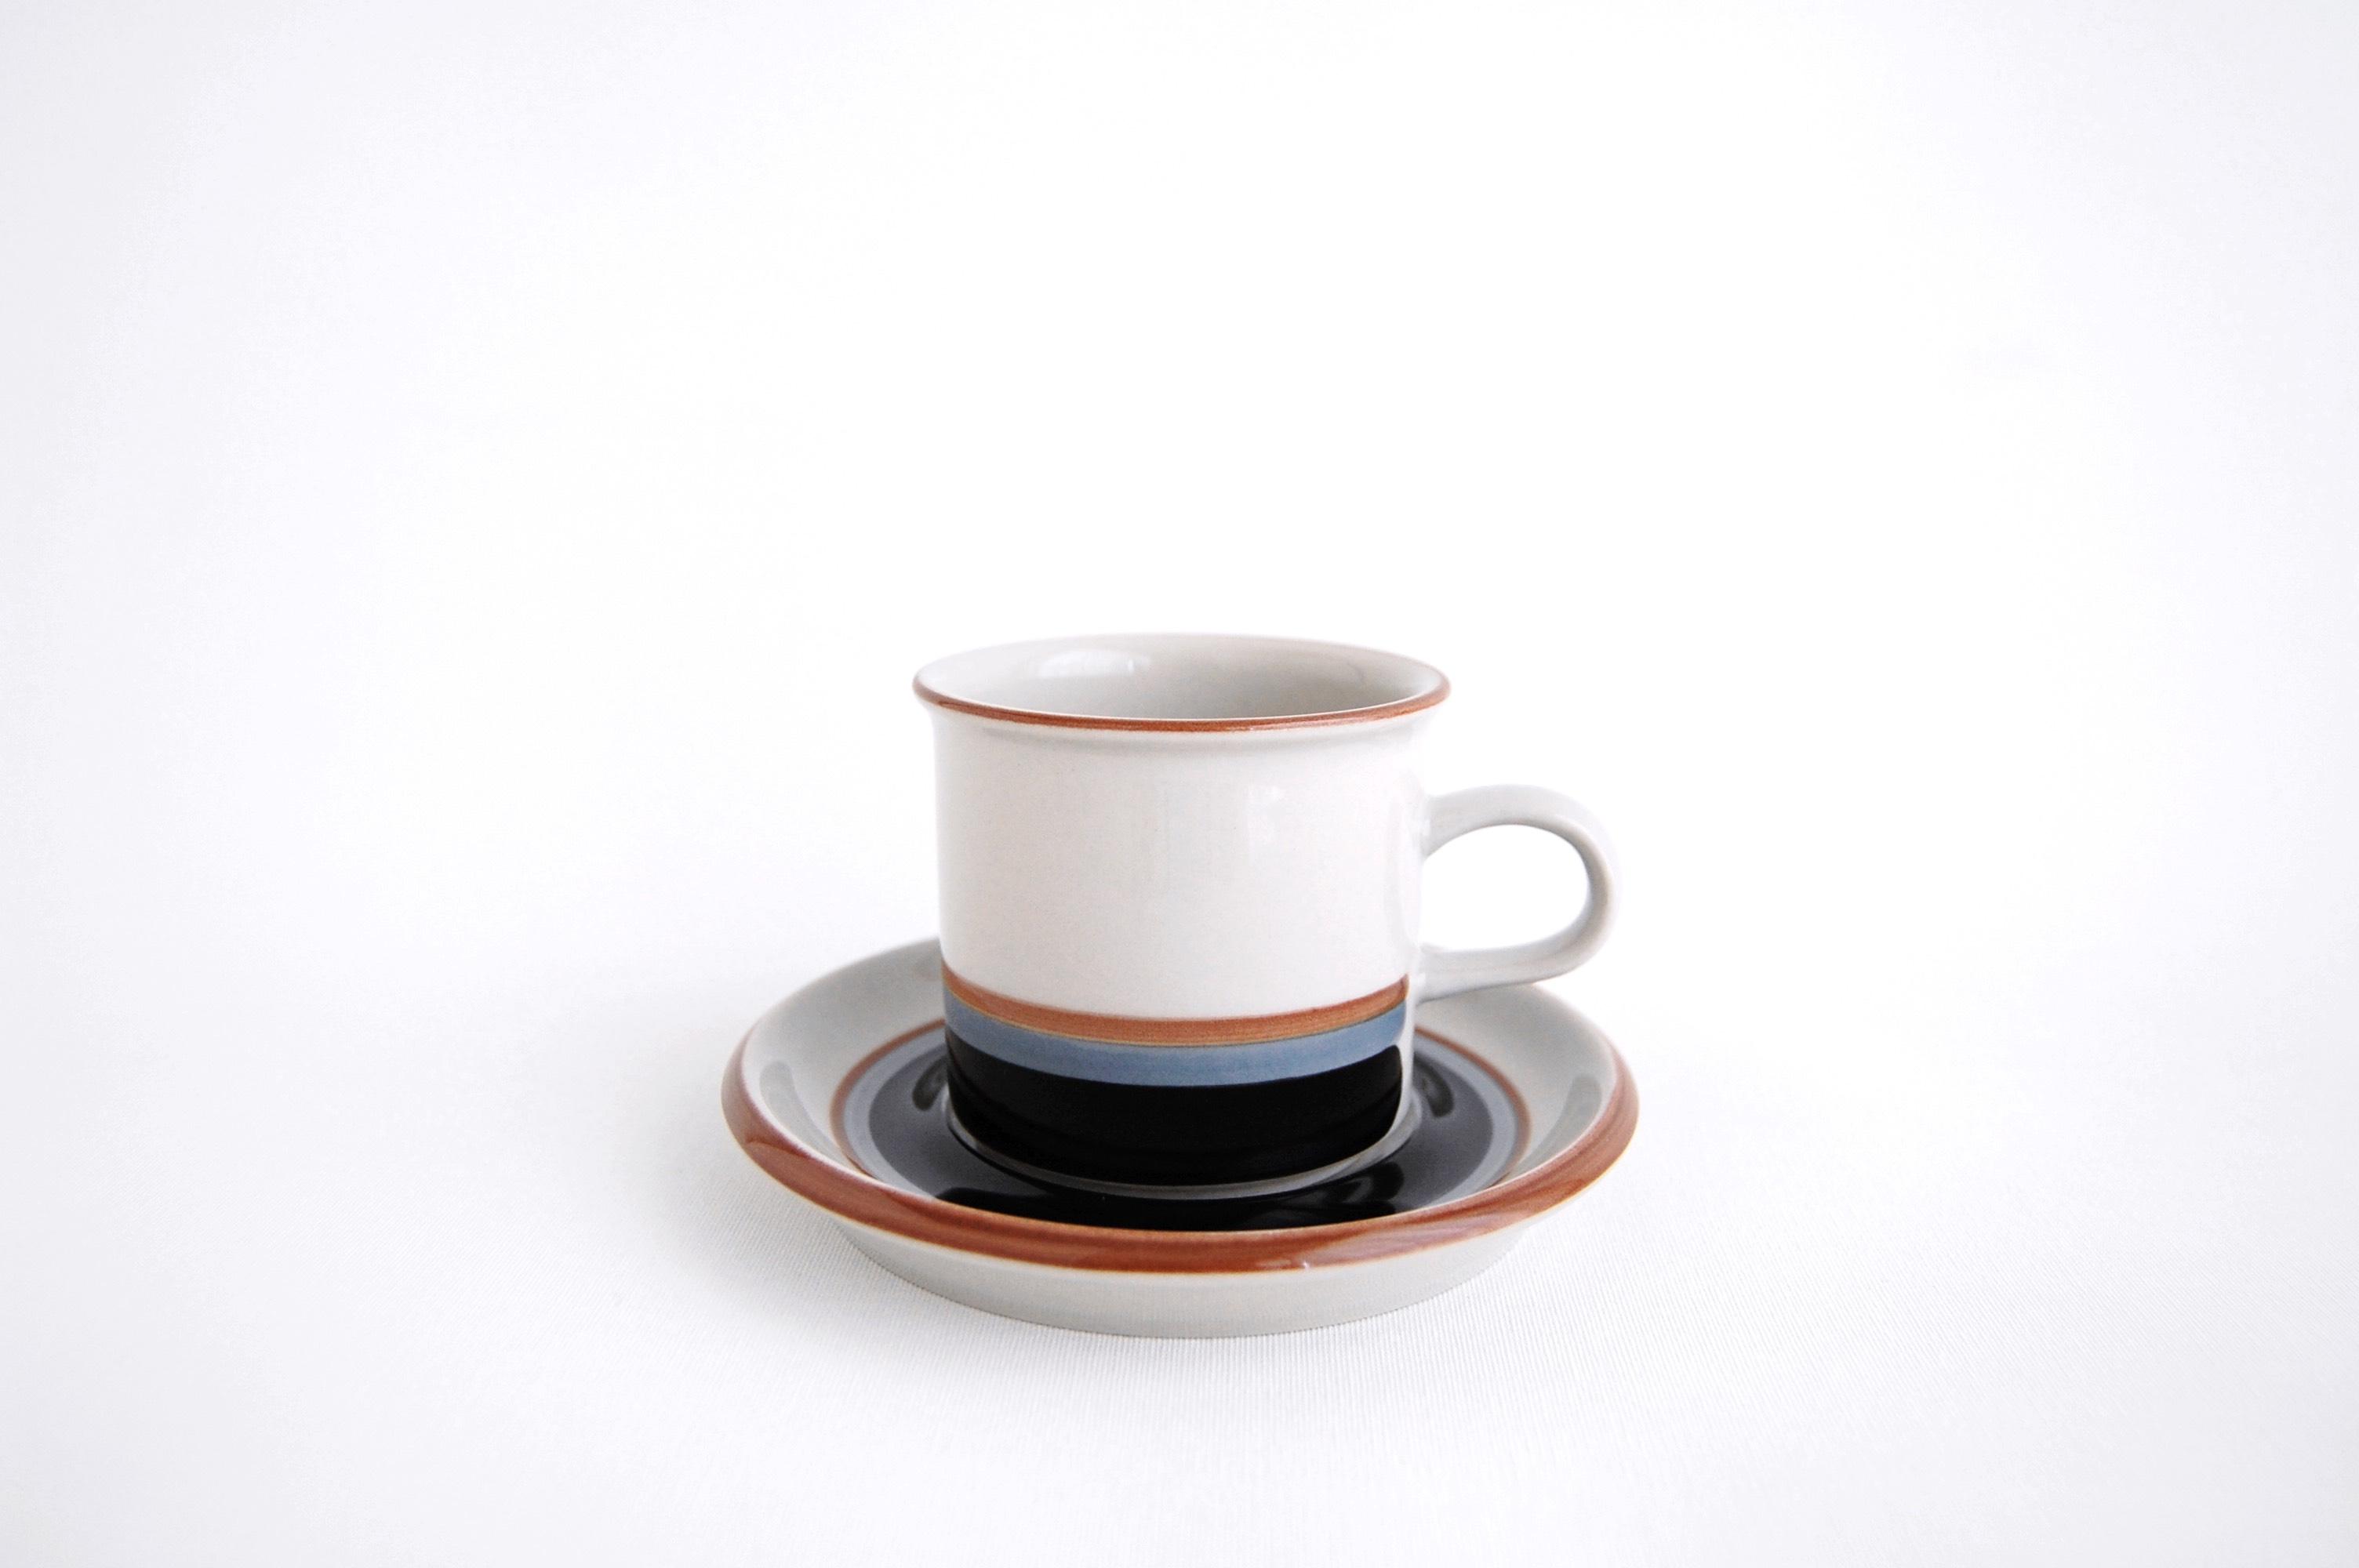 ARABIA/アラビア Taika/タイカ コーヒーカップ&ソーサー(ショートサイズ) 001